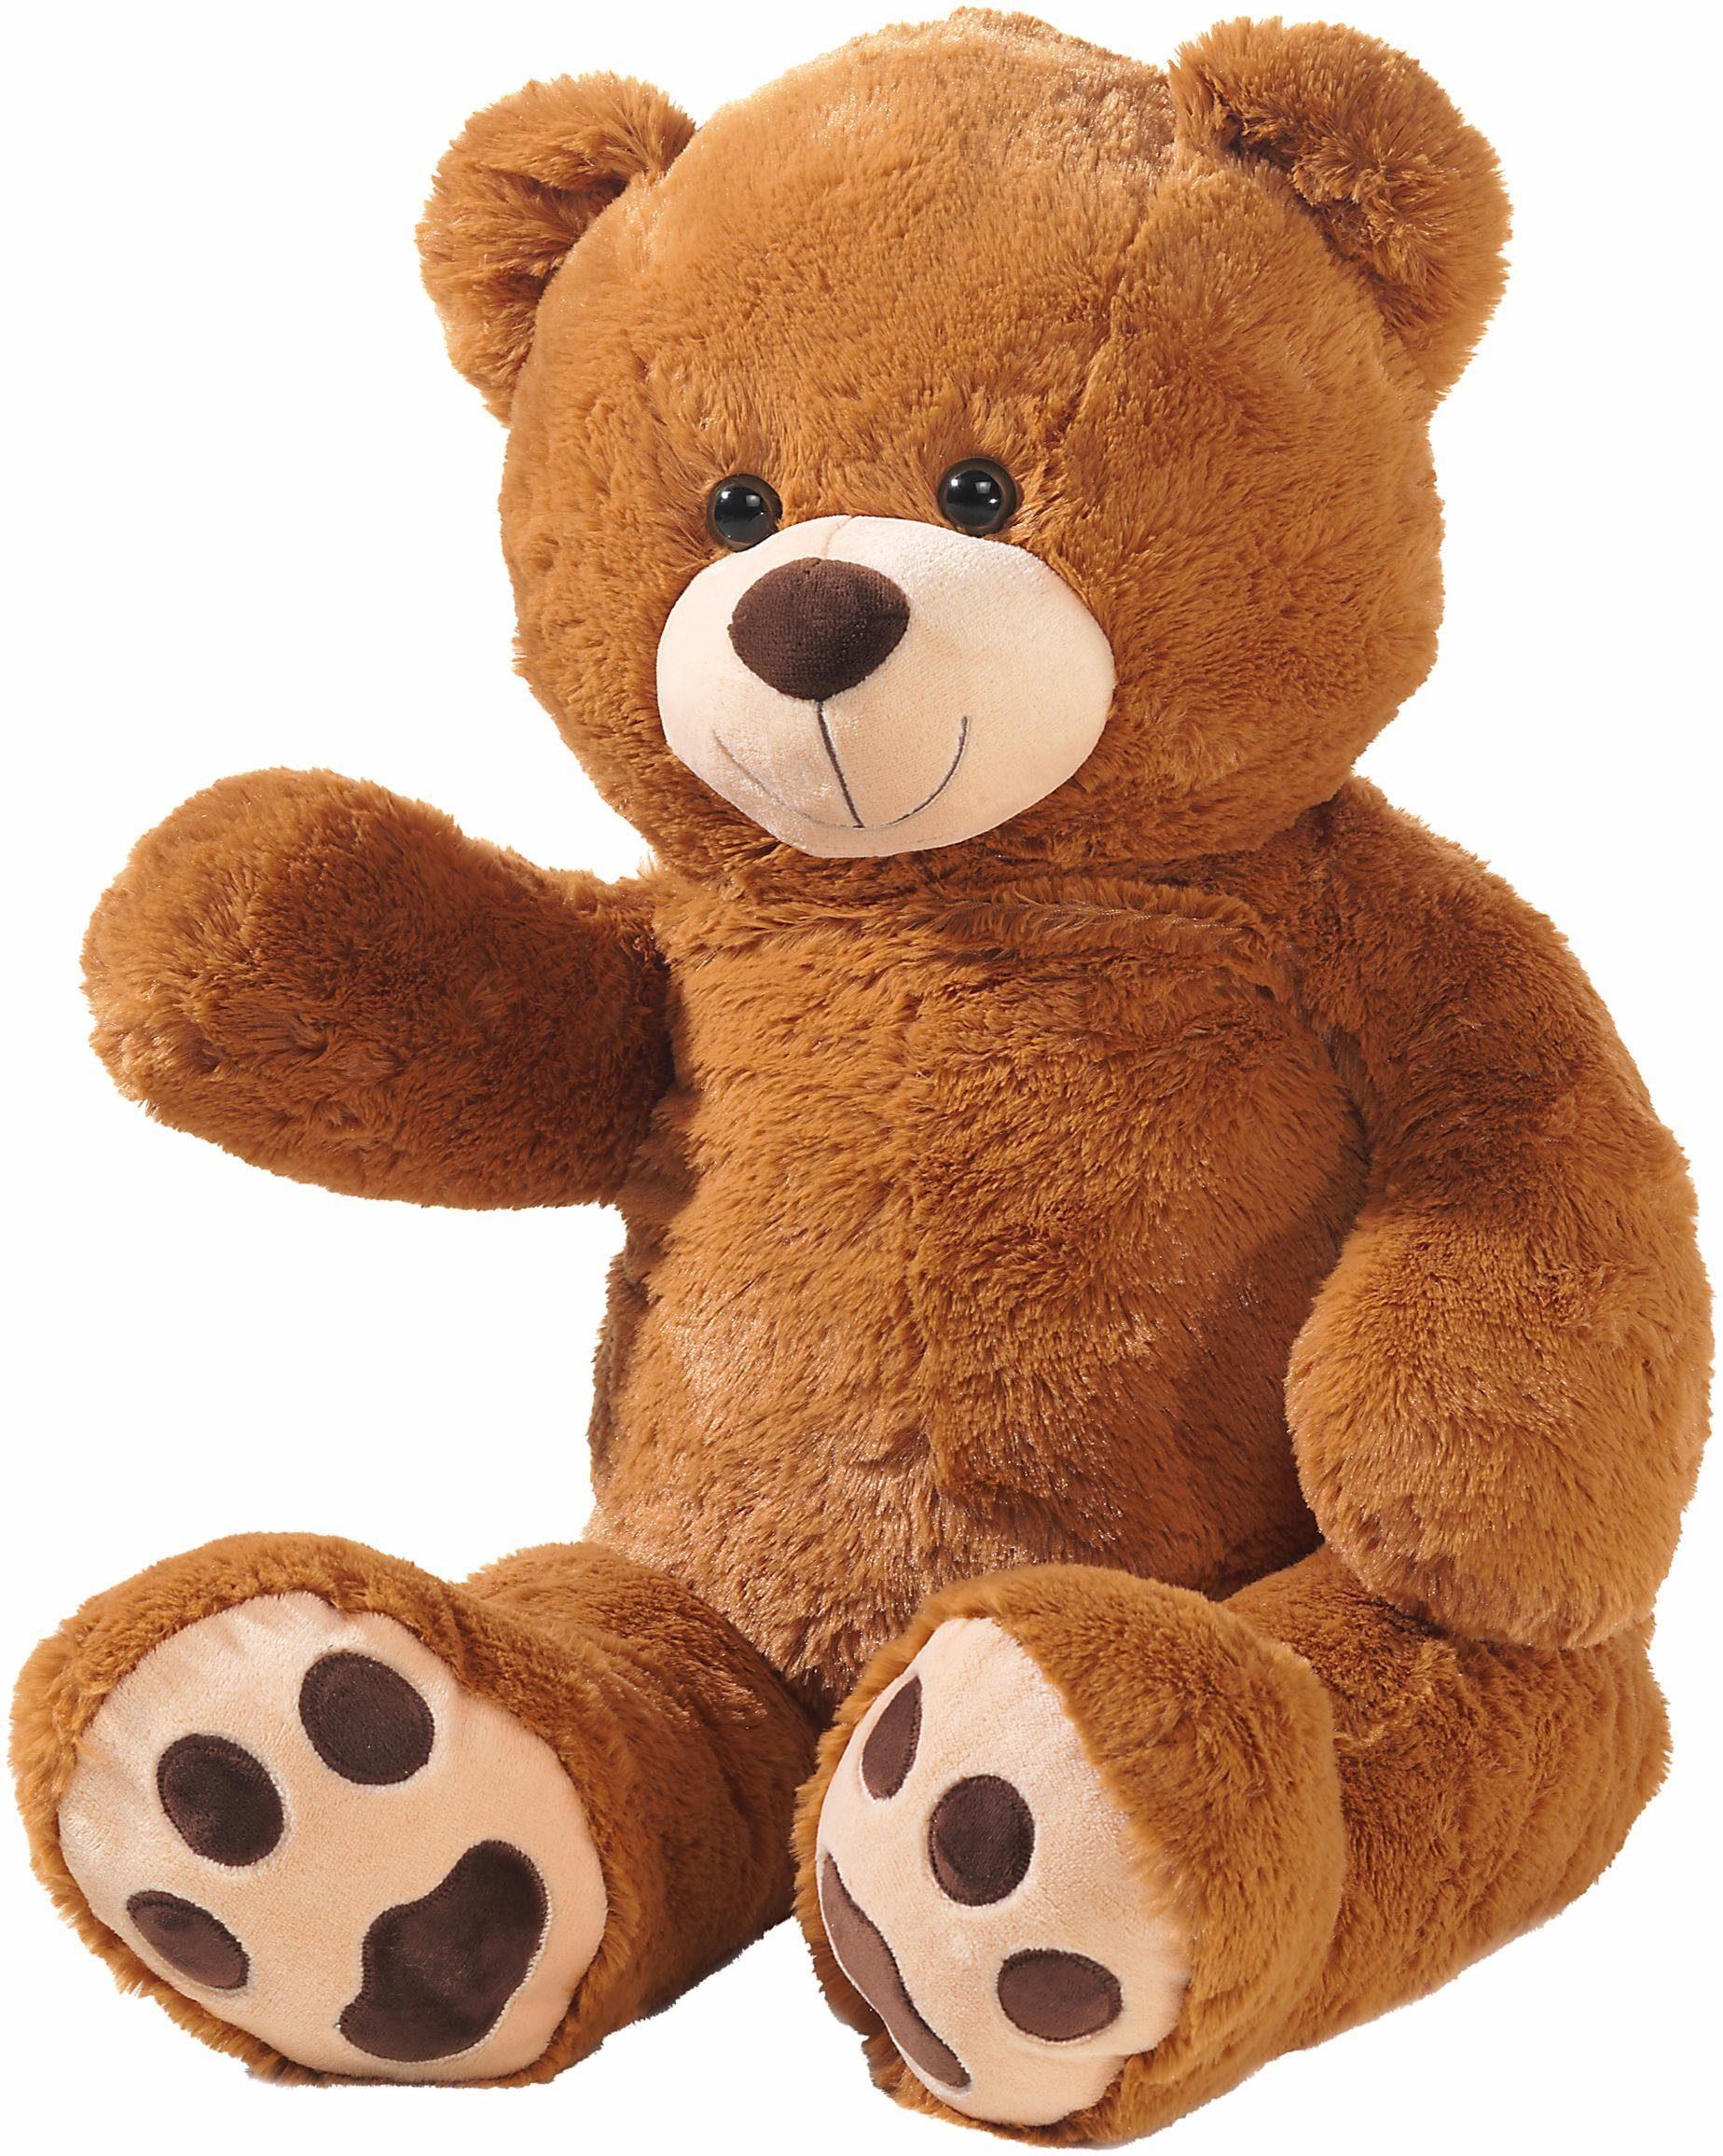 Heunec Plüschtier, »Teddybär braun, 100 cm«